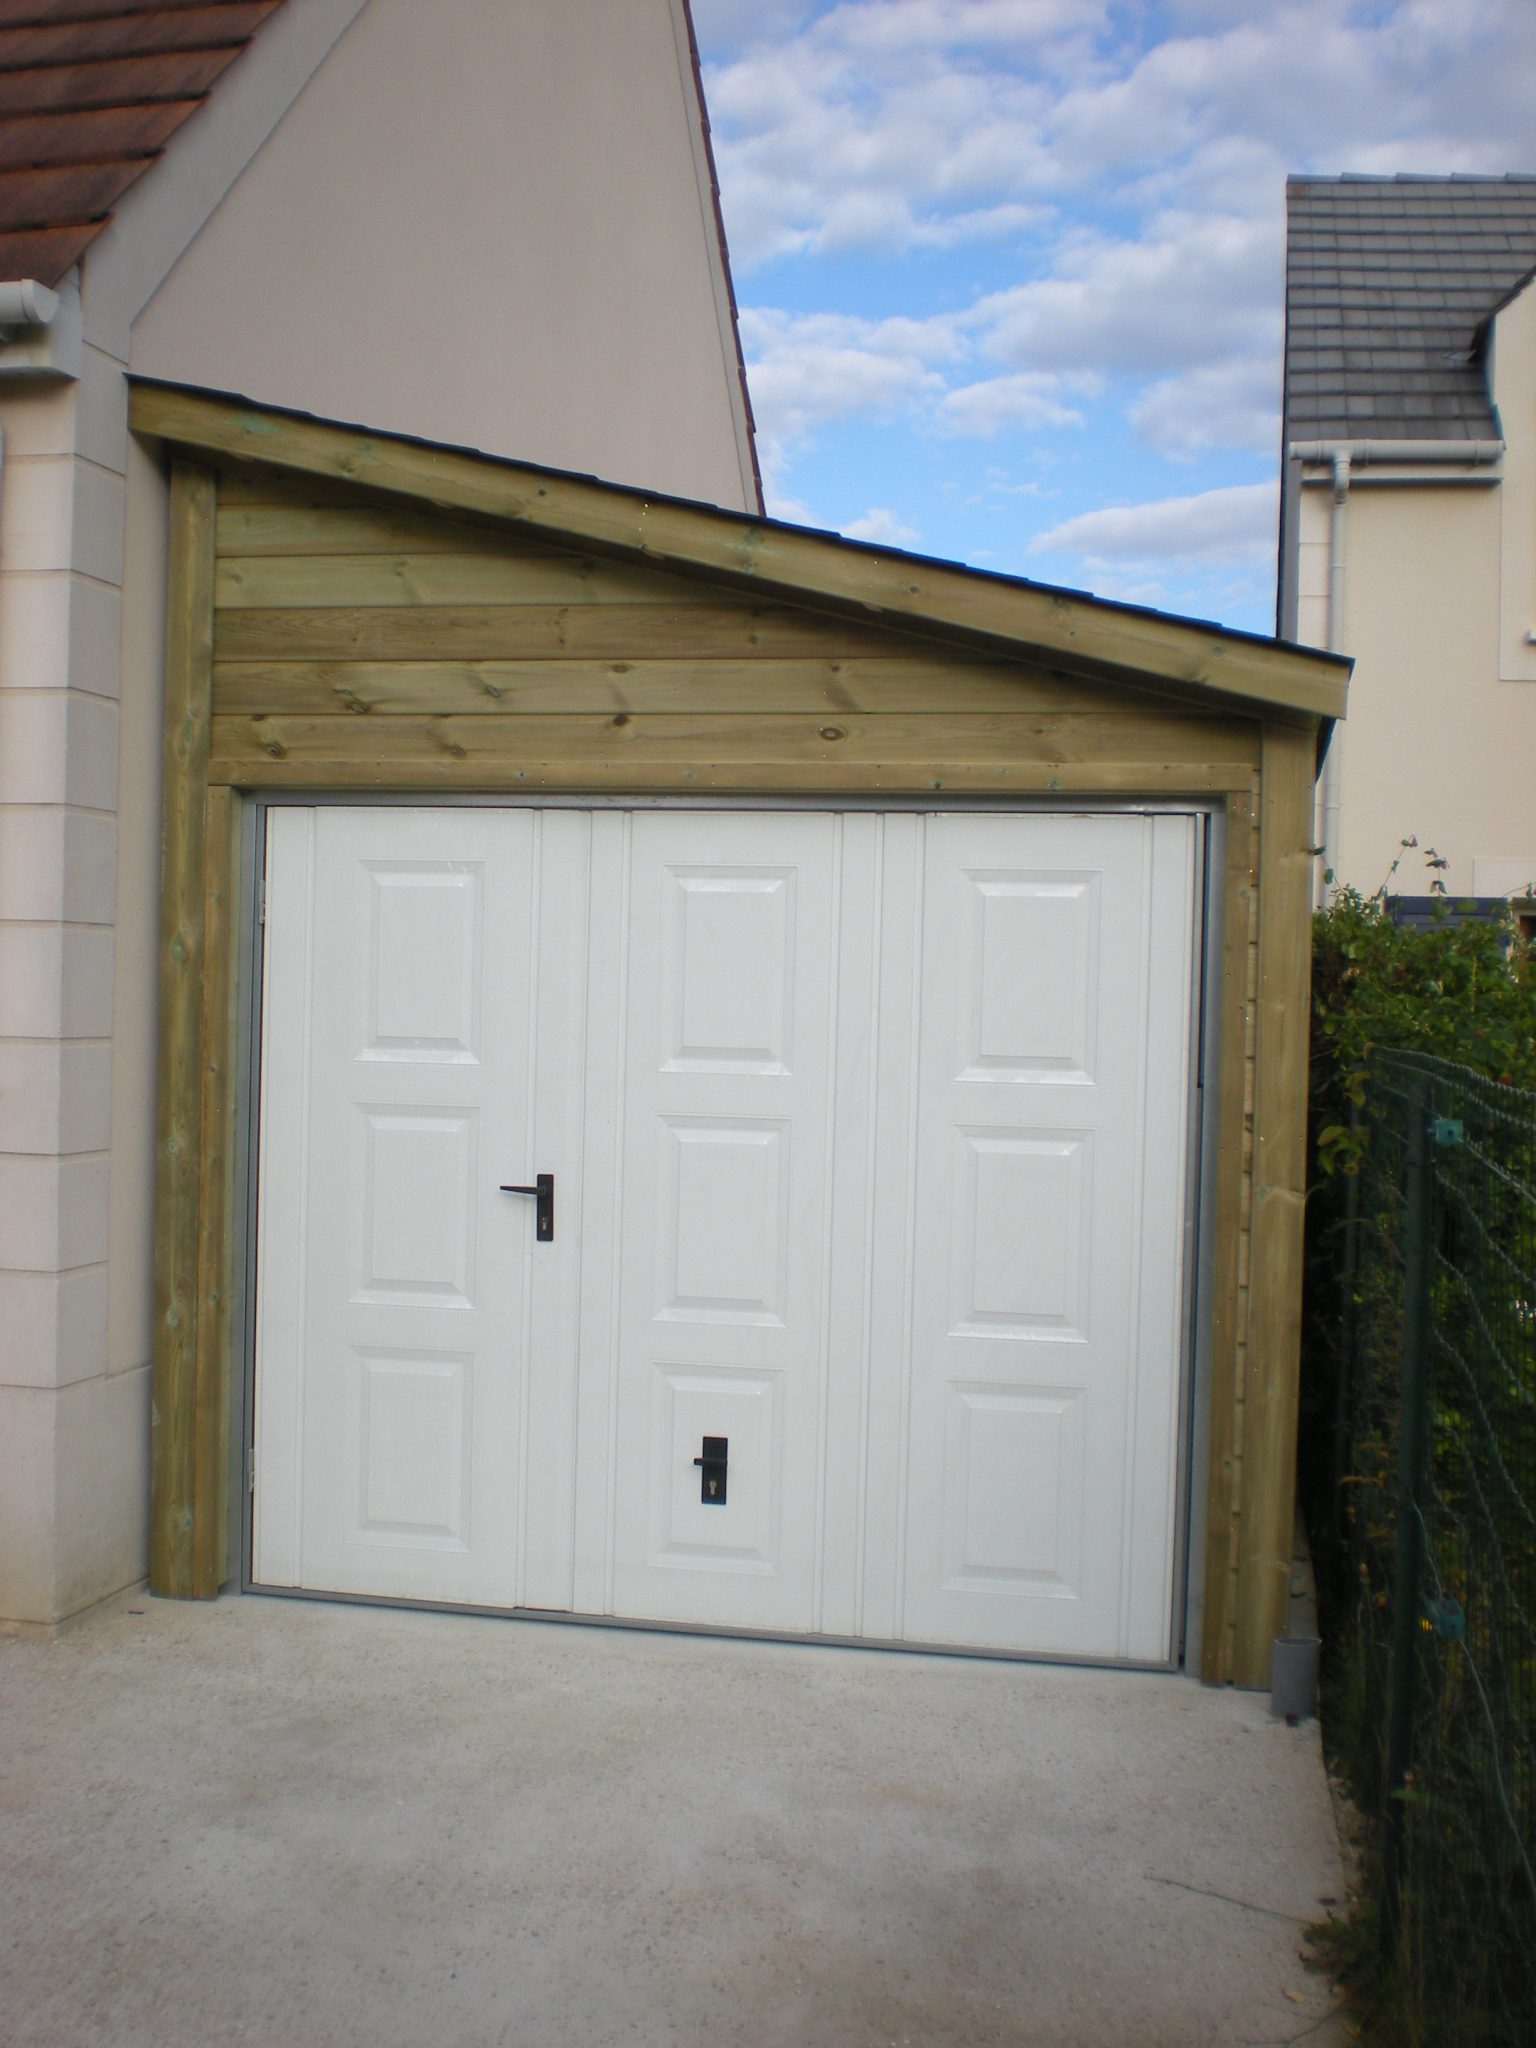 plan garage parpaing 1 pente maison fran ois fabie. Black Bedroom Furniture Sets. Home Design Ideas